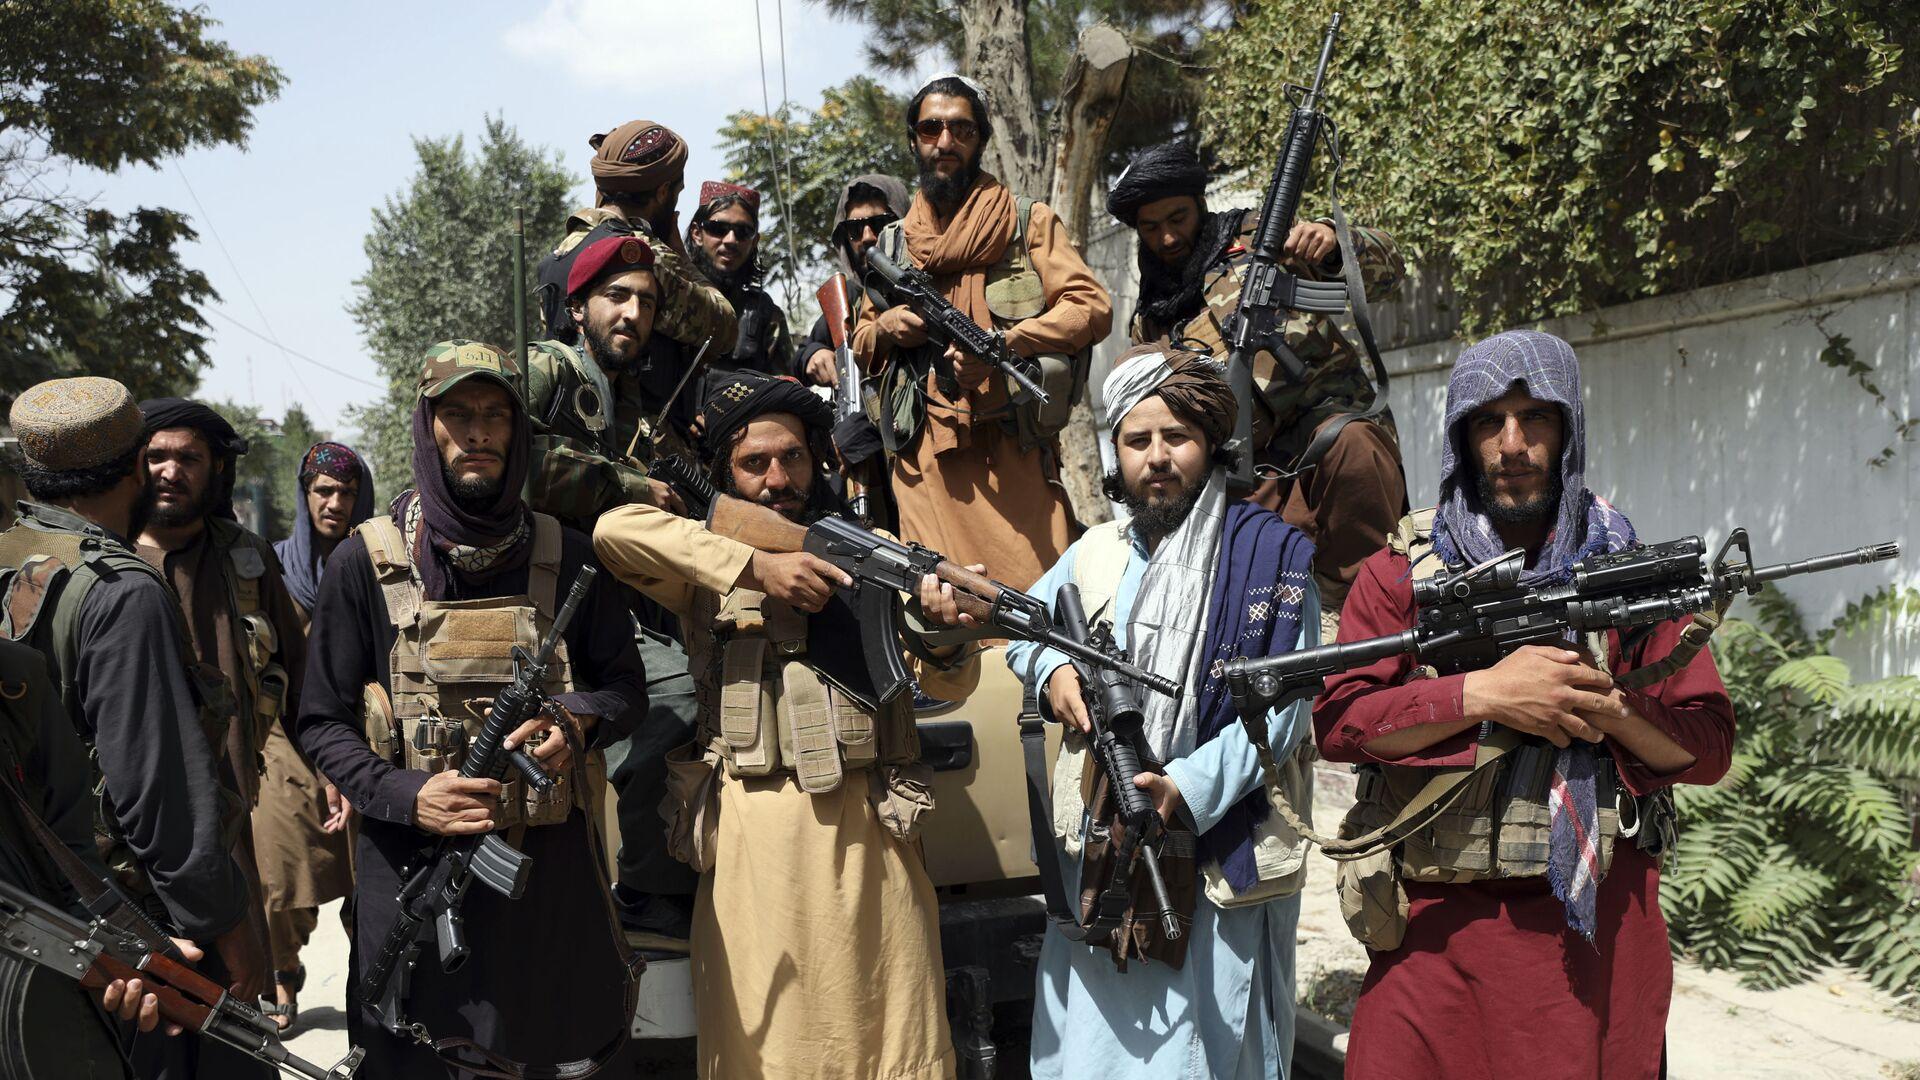 I membri dei talebani* a Kabul - Sputnik Italia, 1920, 06.09.2021